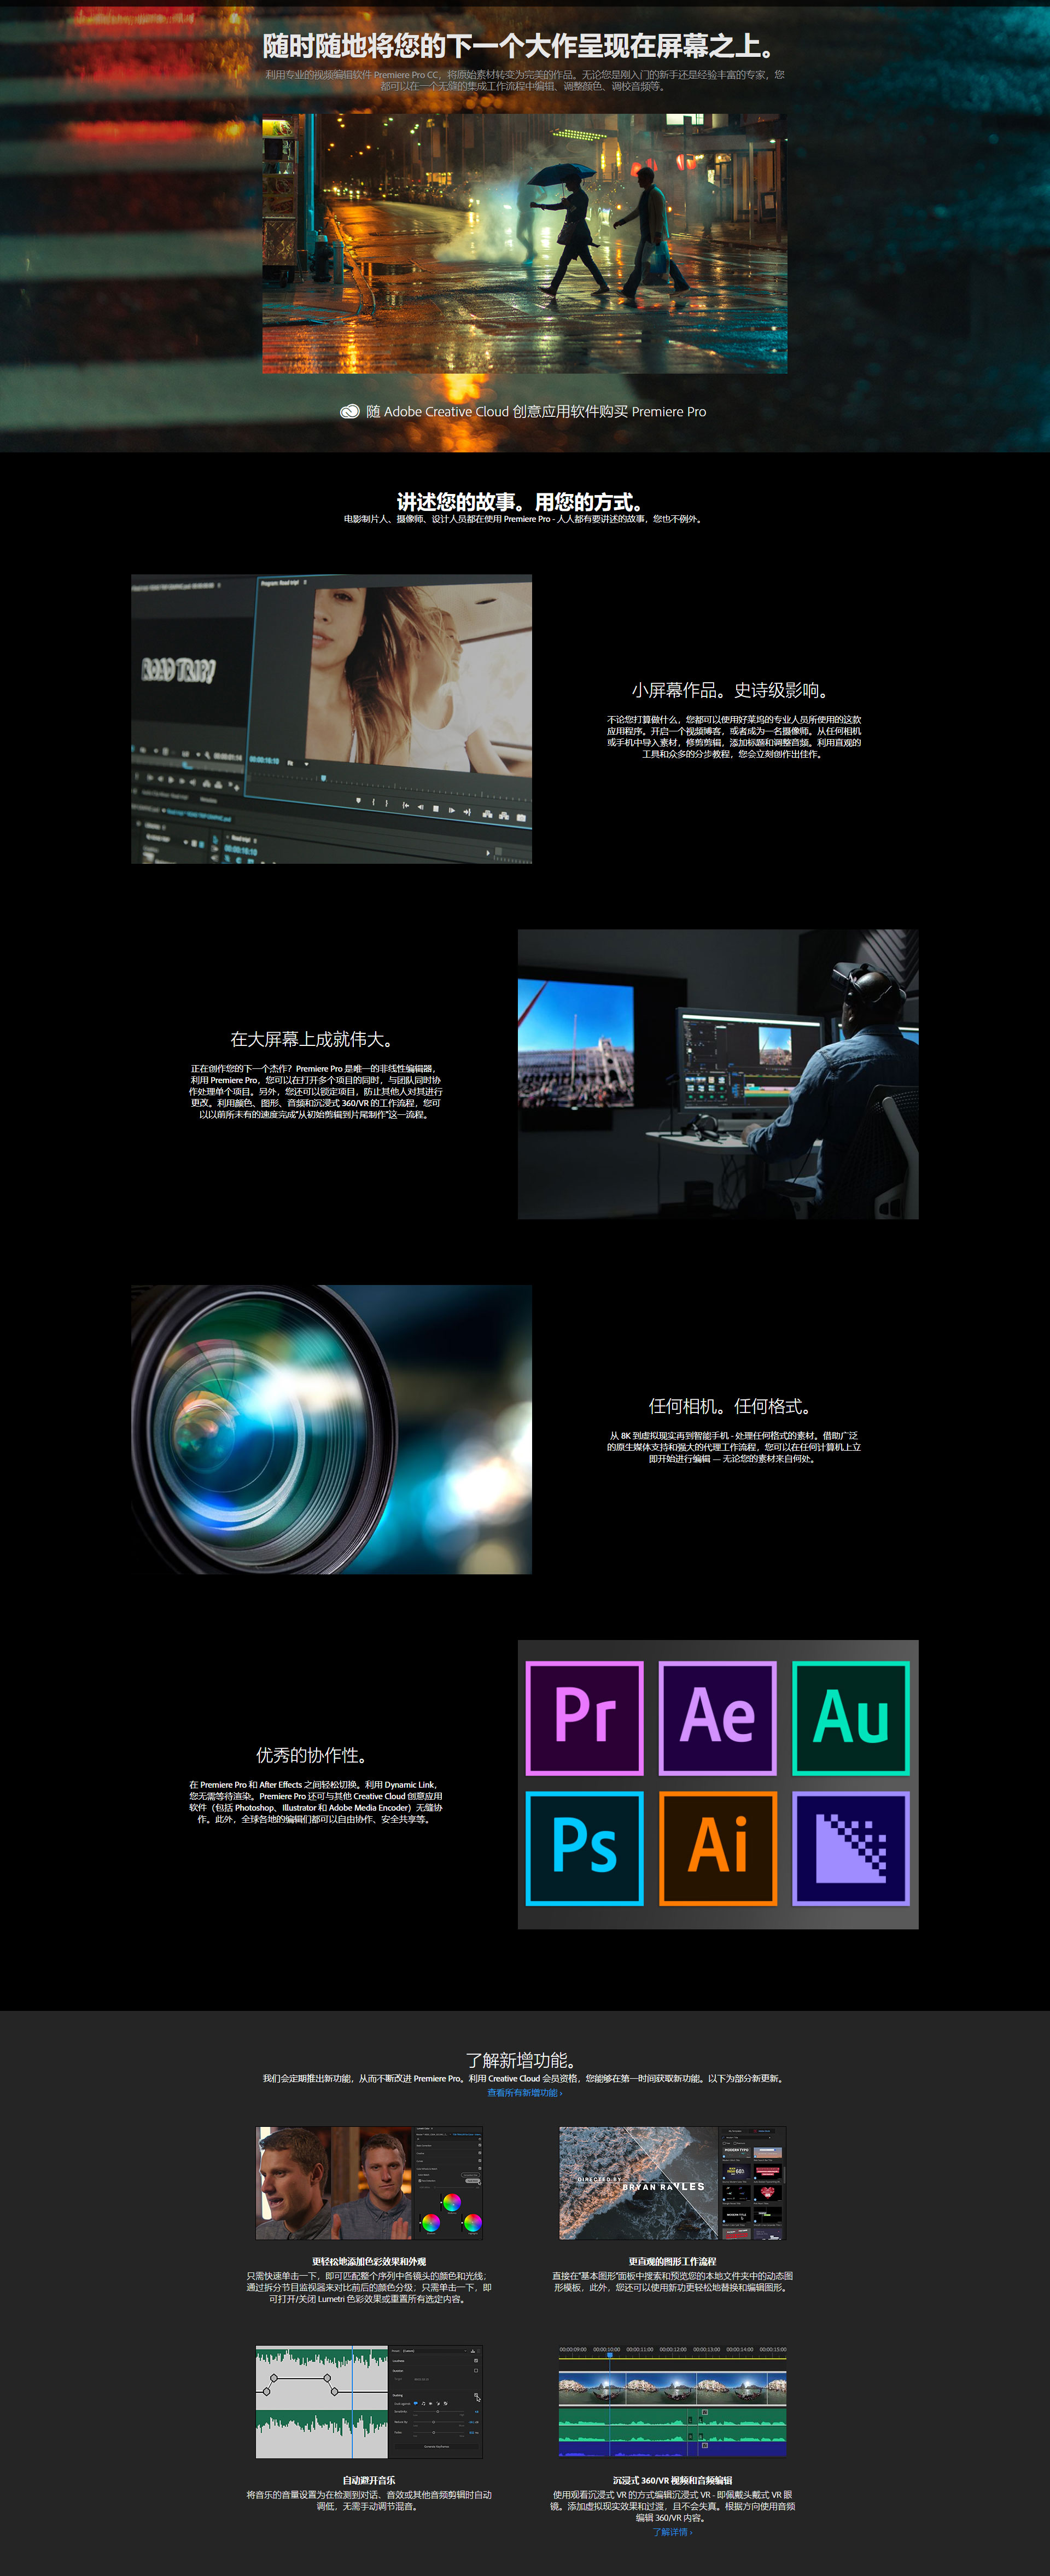 premiere pro cc 2019 mac 破解 版